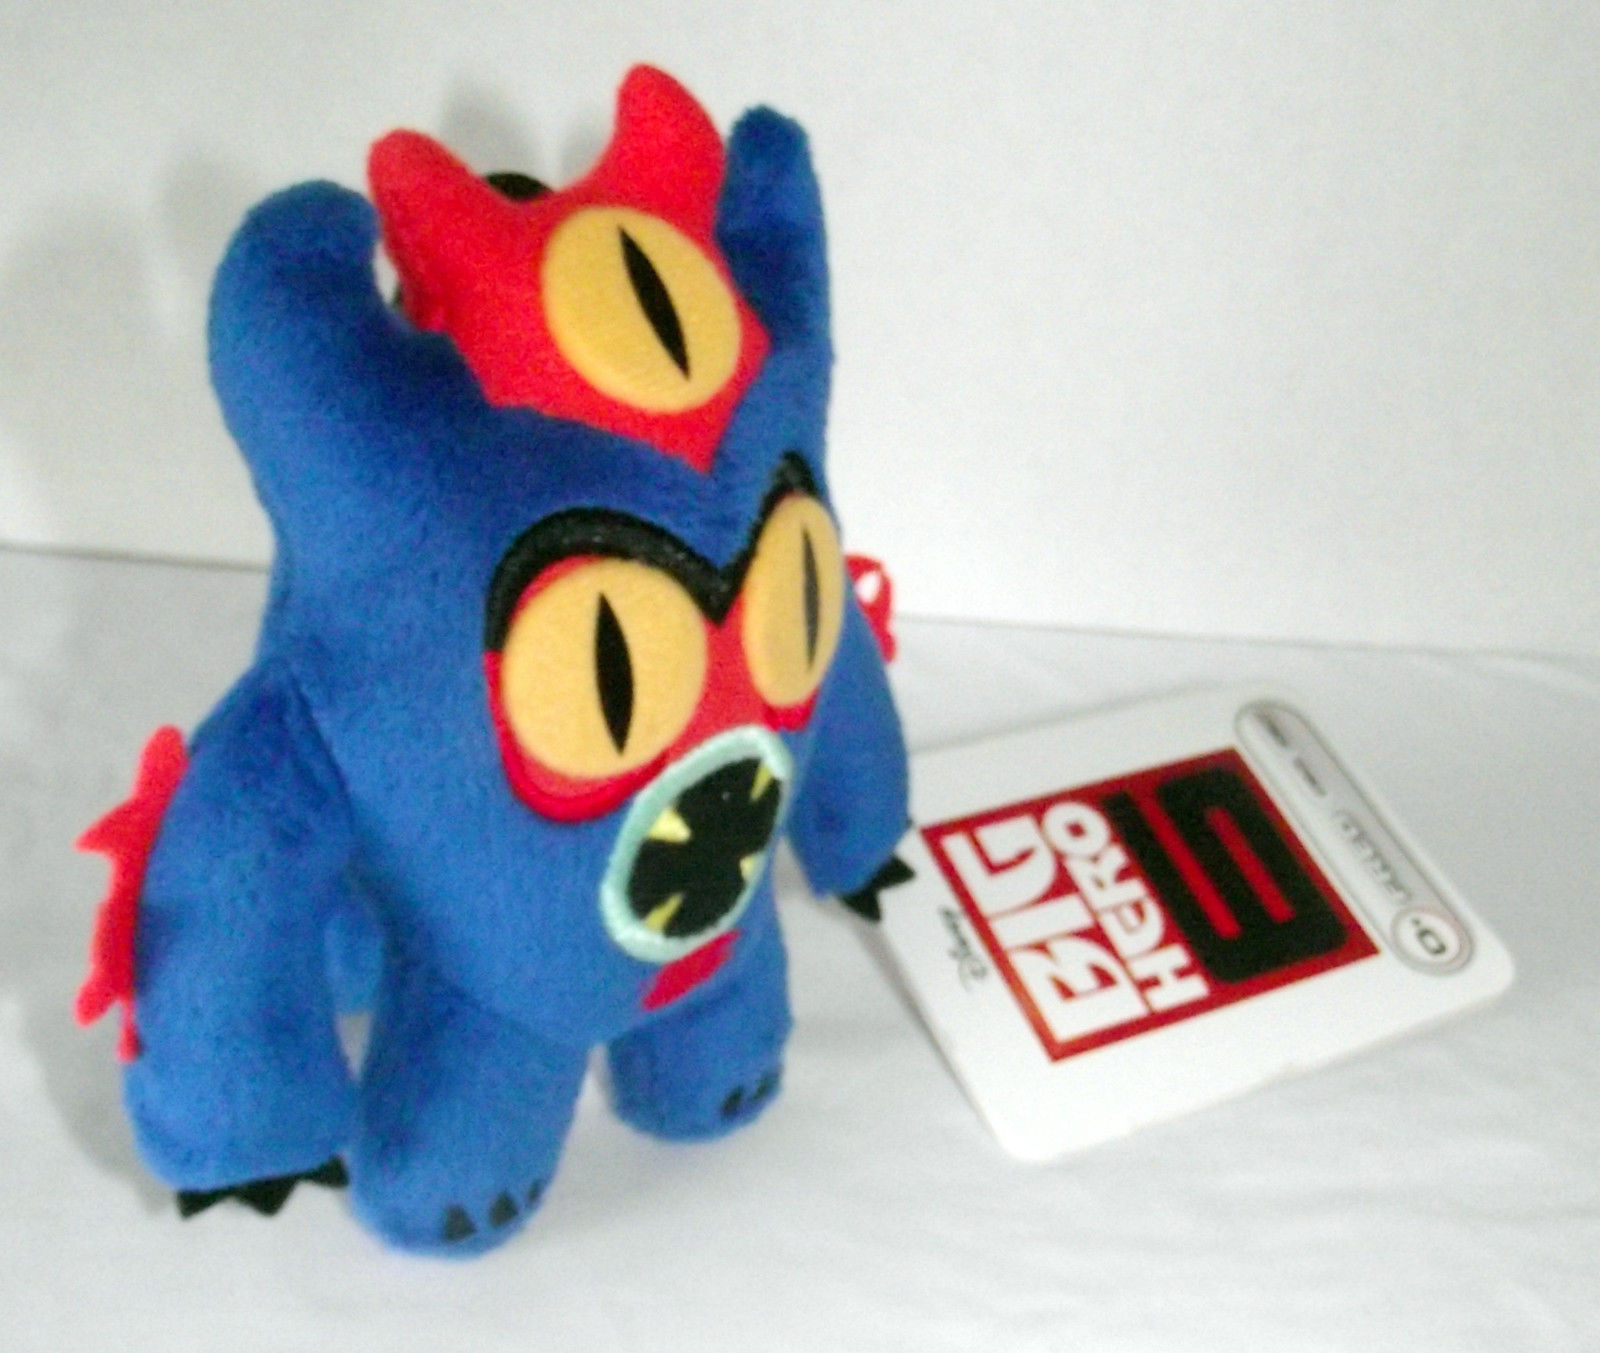 Fred Plush 38627 Disney Big Hero 6 Stuffed Toy Ornament Doll Blue Monster NWT